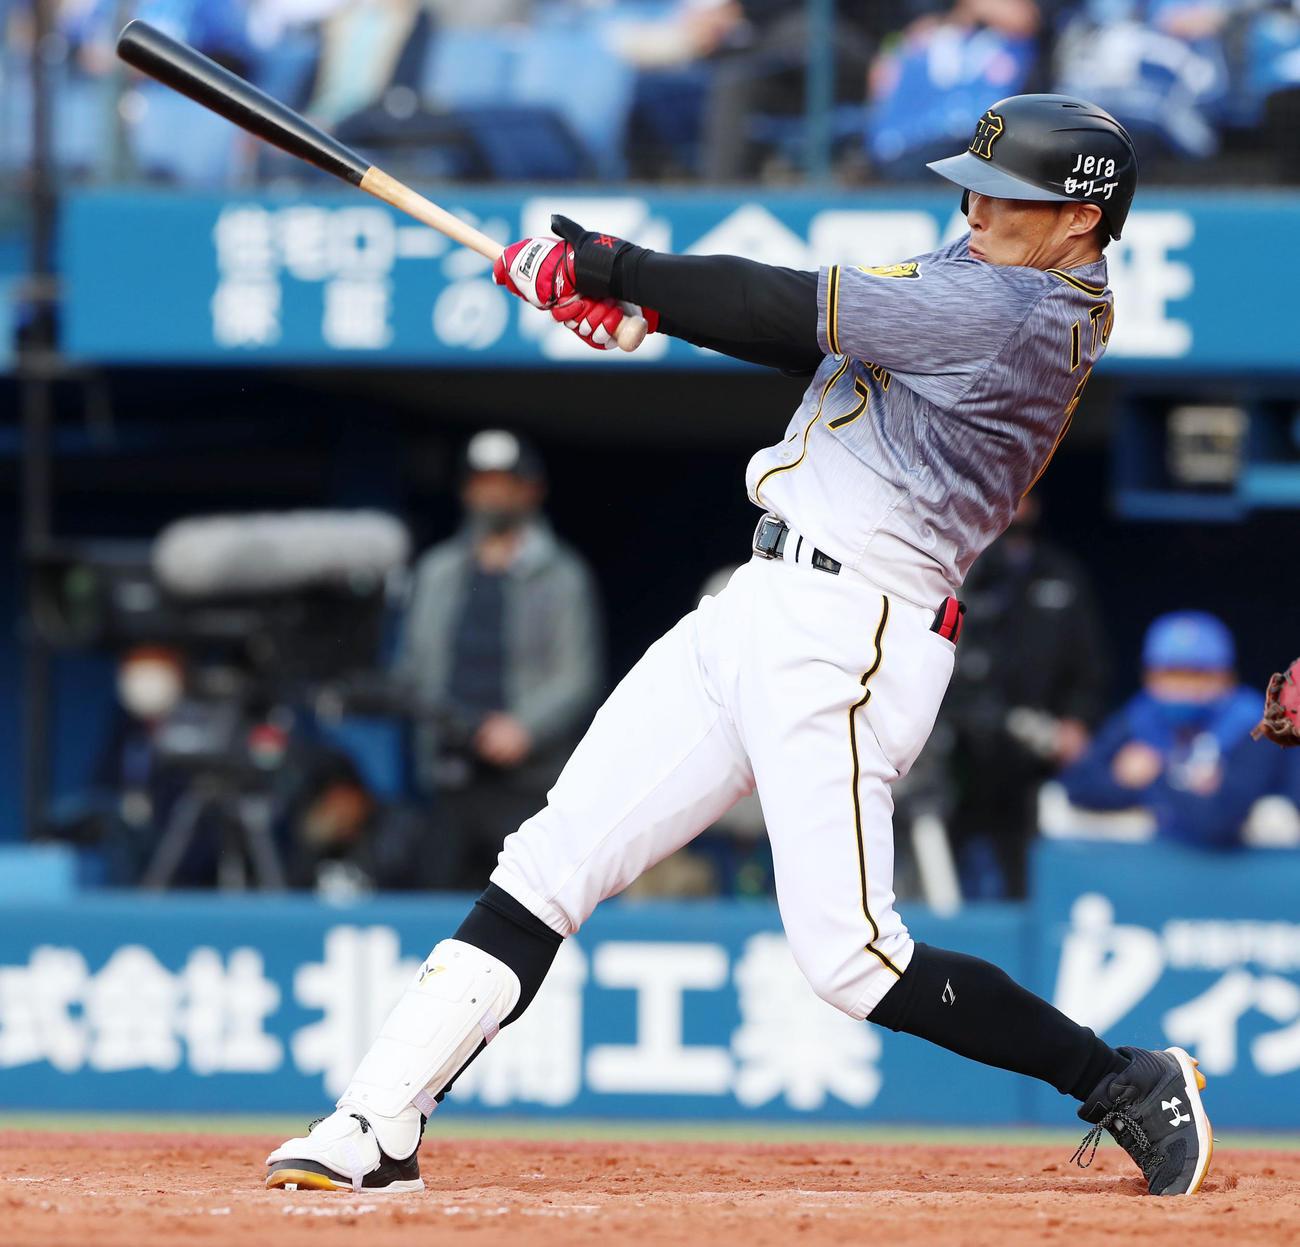 DeNA対阪神 9回表阪神2死一塁、代打糸井は右前打を放つ(撮影・加藤哉)